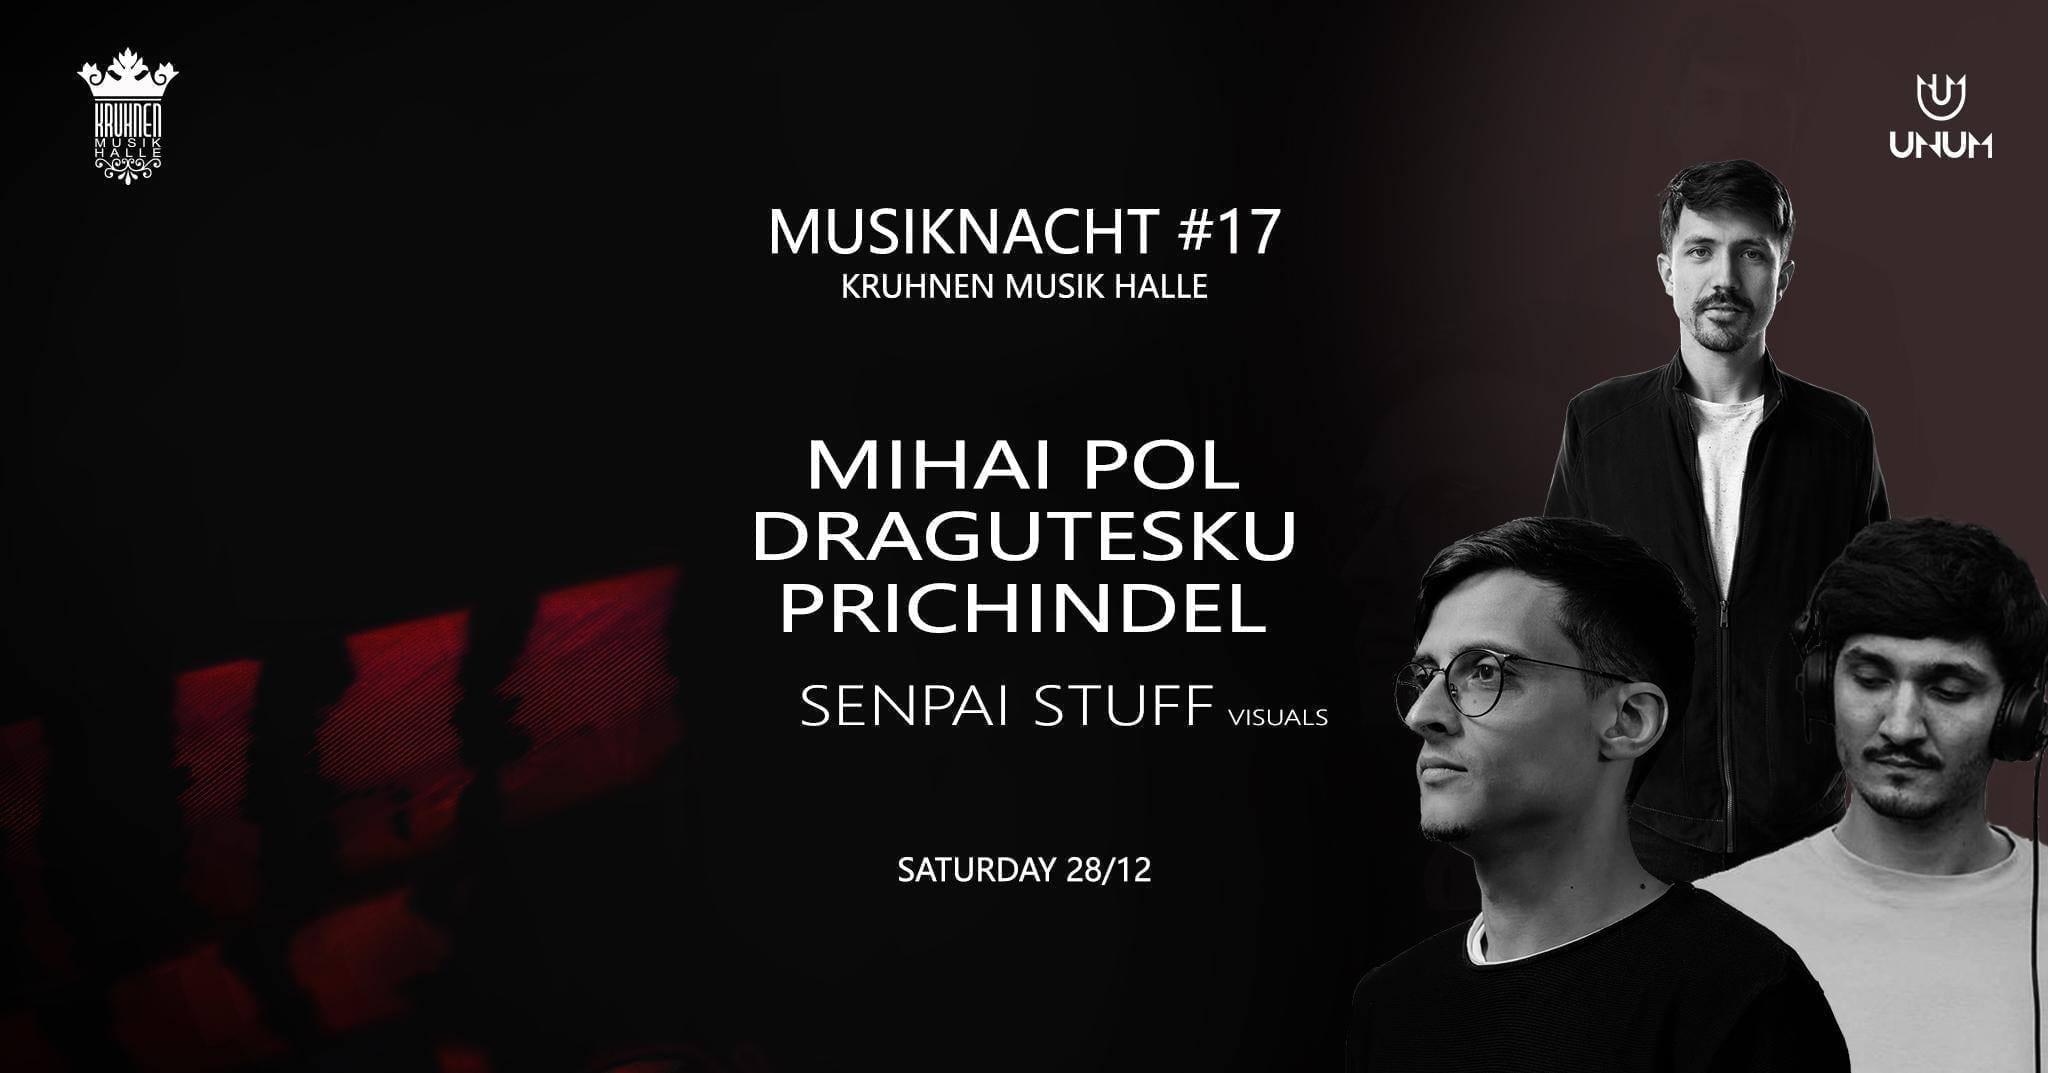 Musiknacht #17: Mihai Pol, Prichindel, Dragutesku